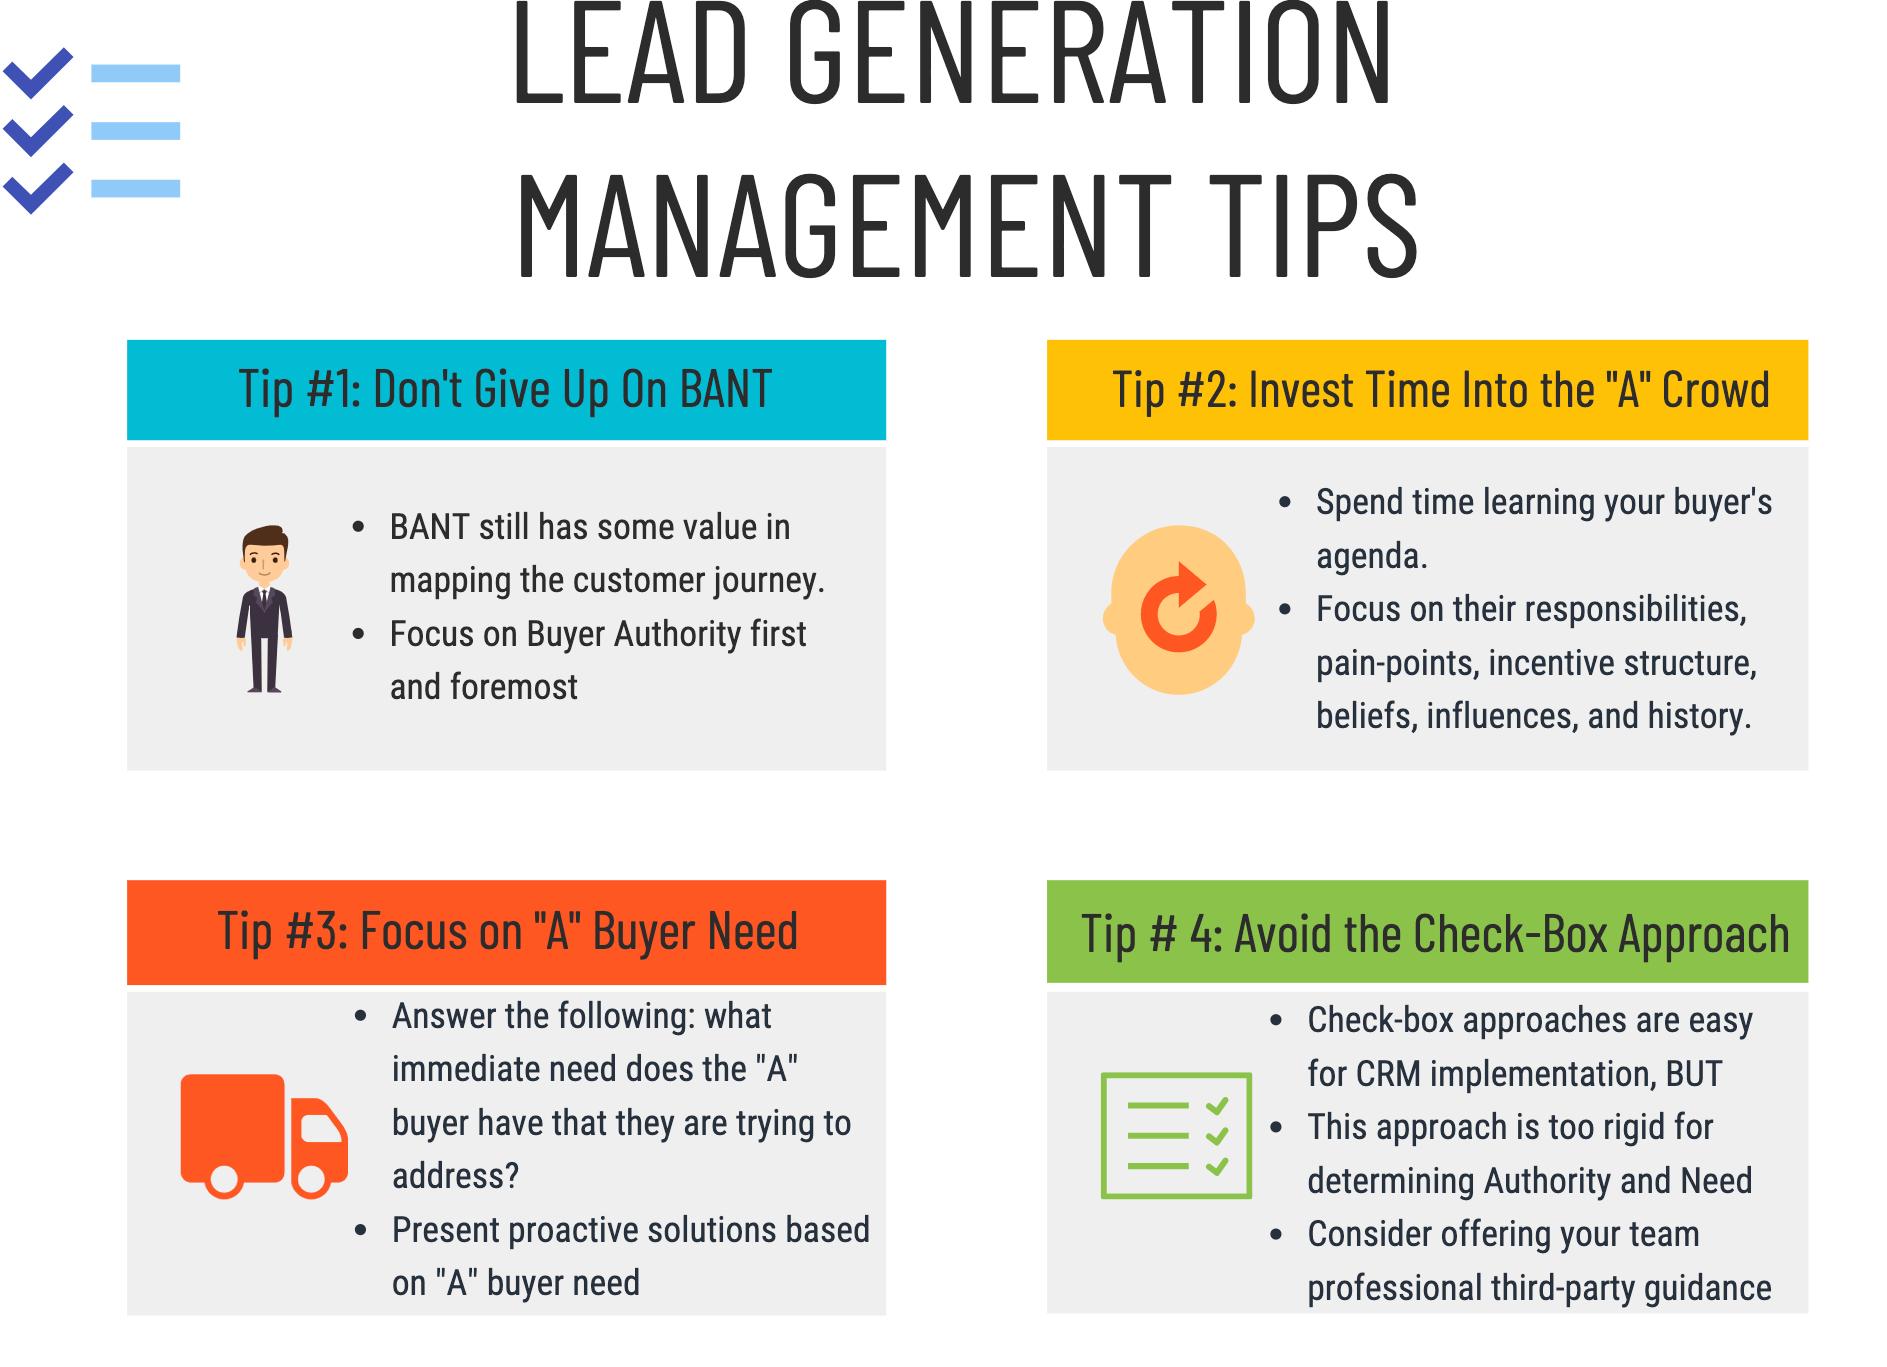 Lead Generation Management Tips